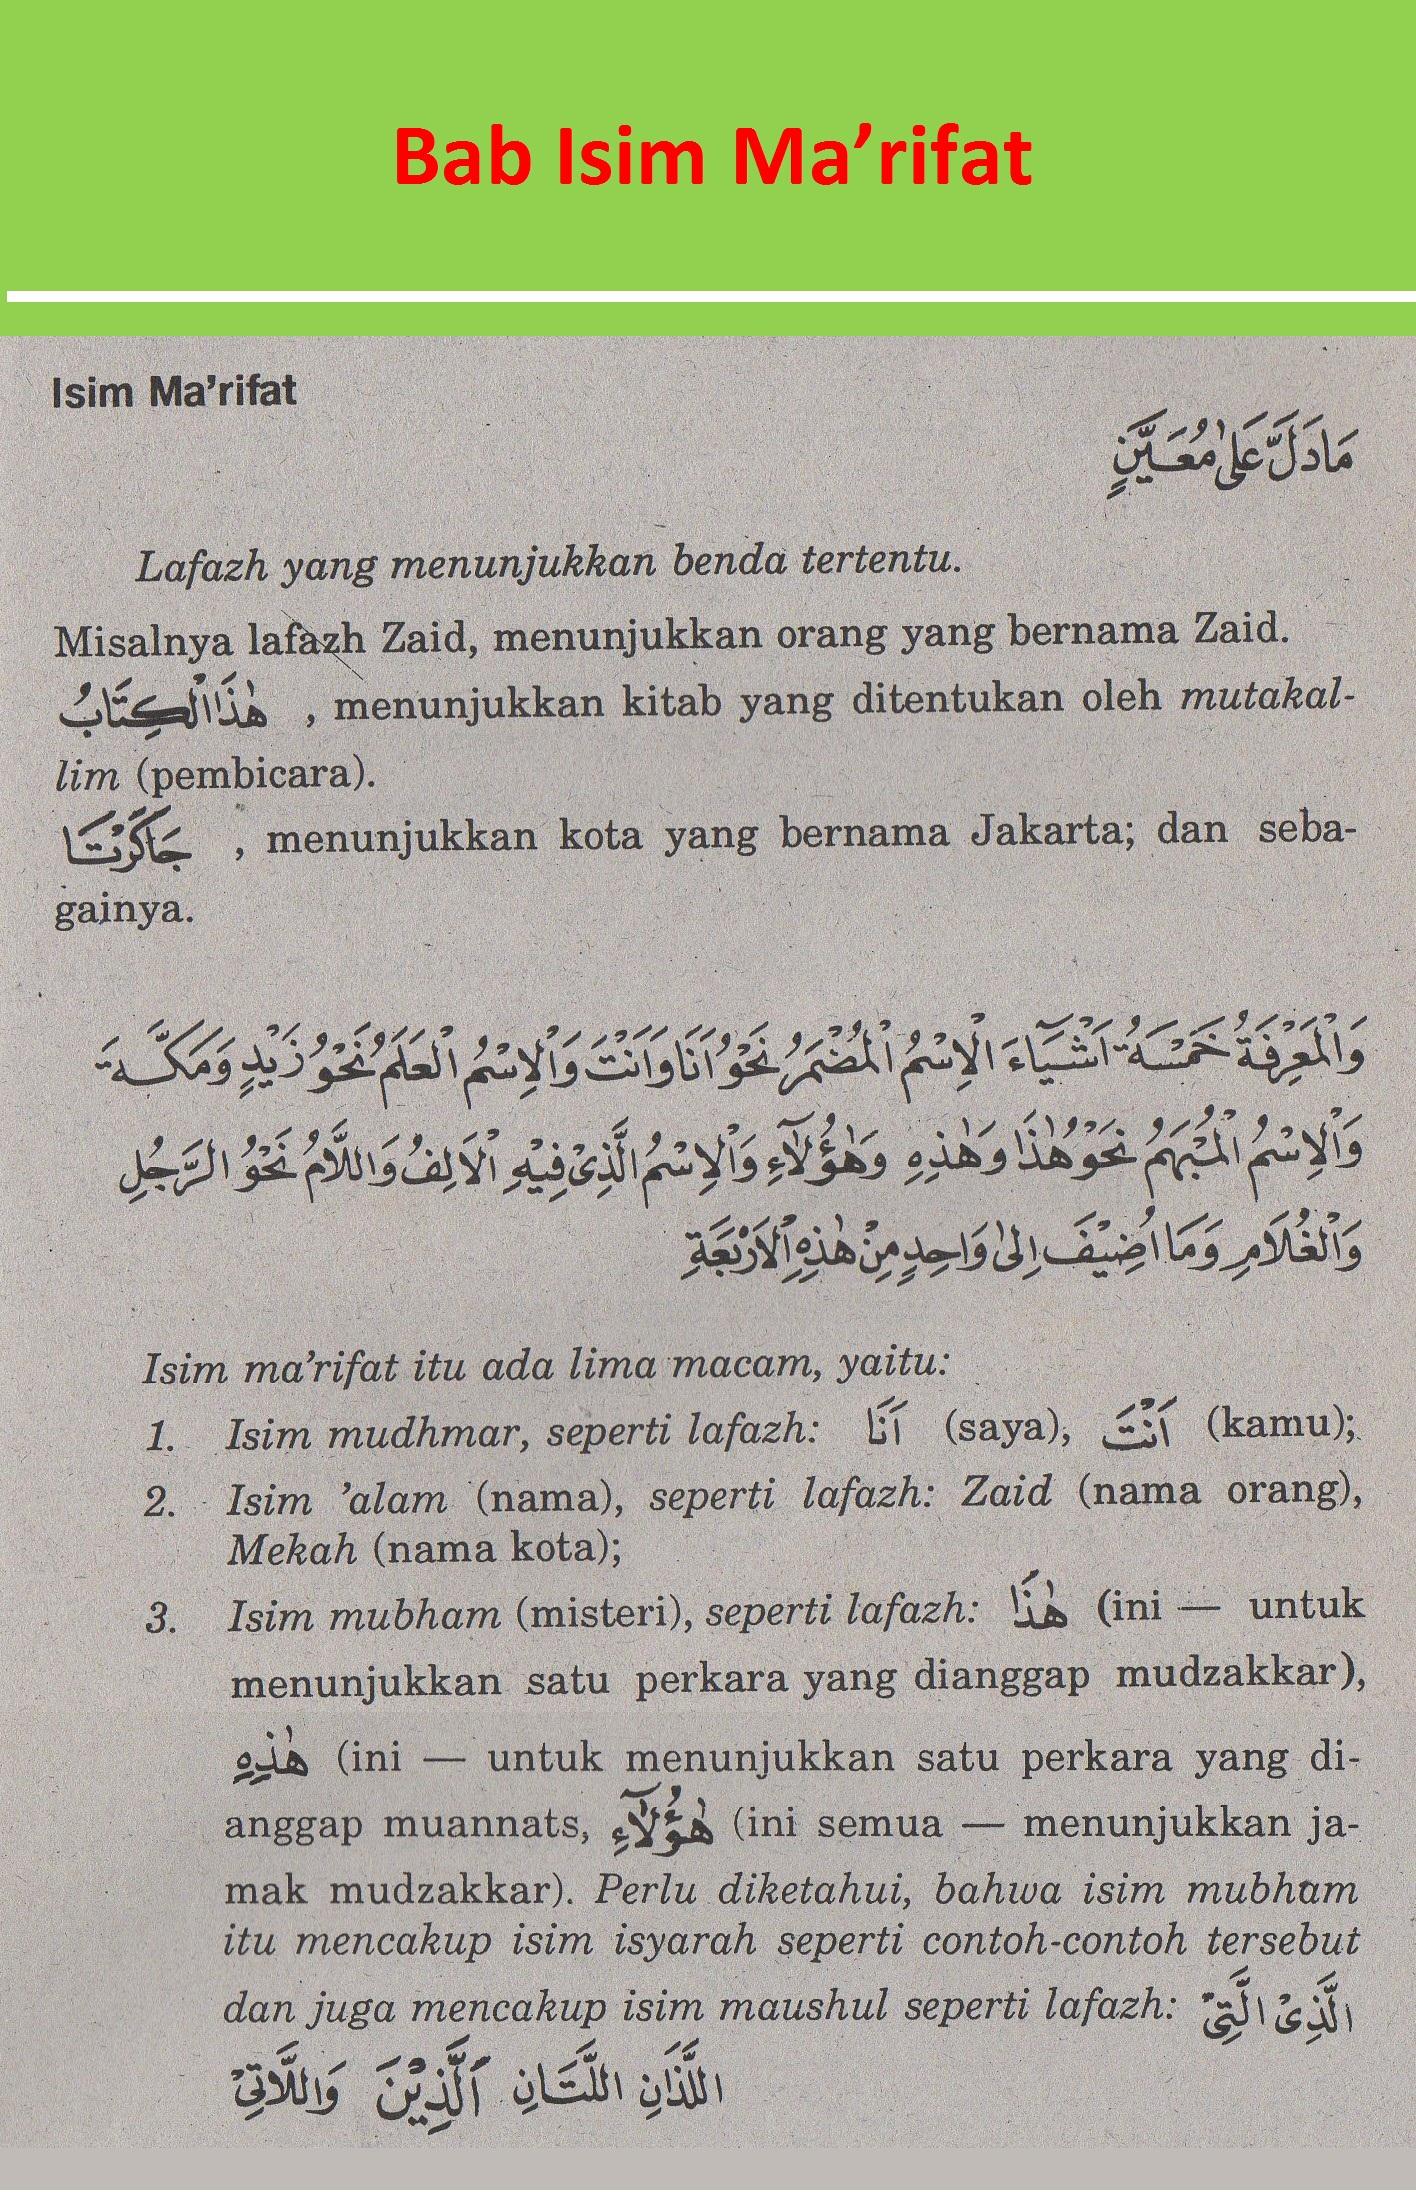 belajar bahasa arab ilmu nahwu bab isim ma rifat 1